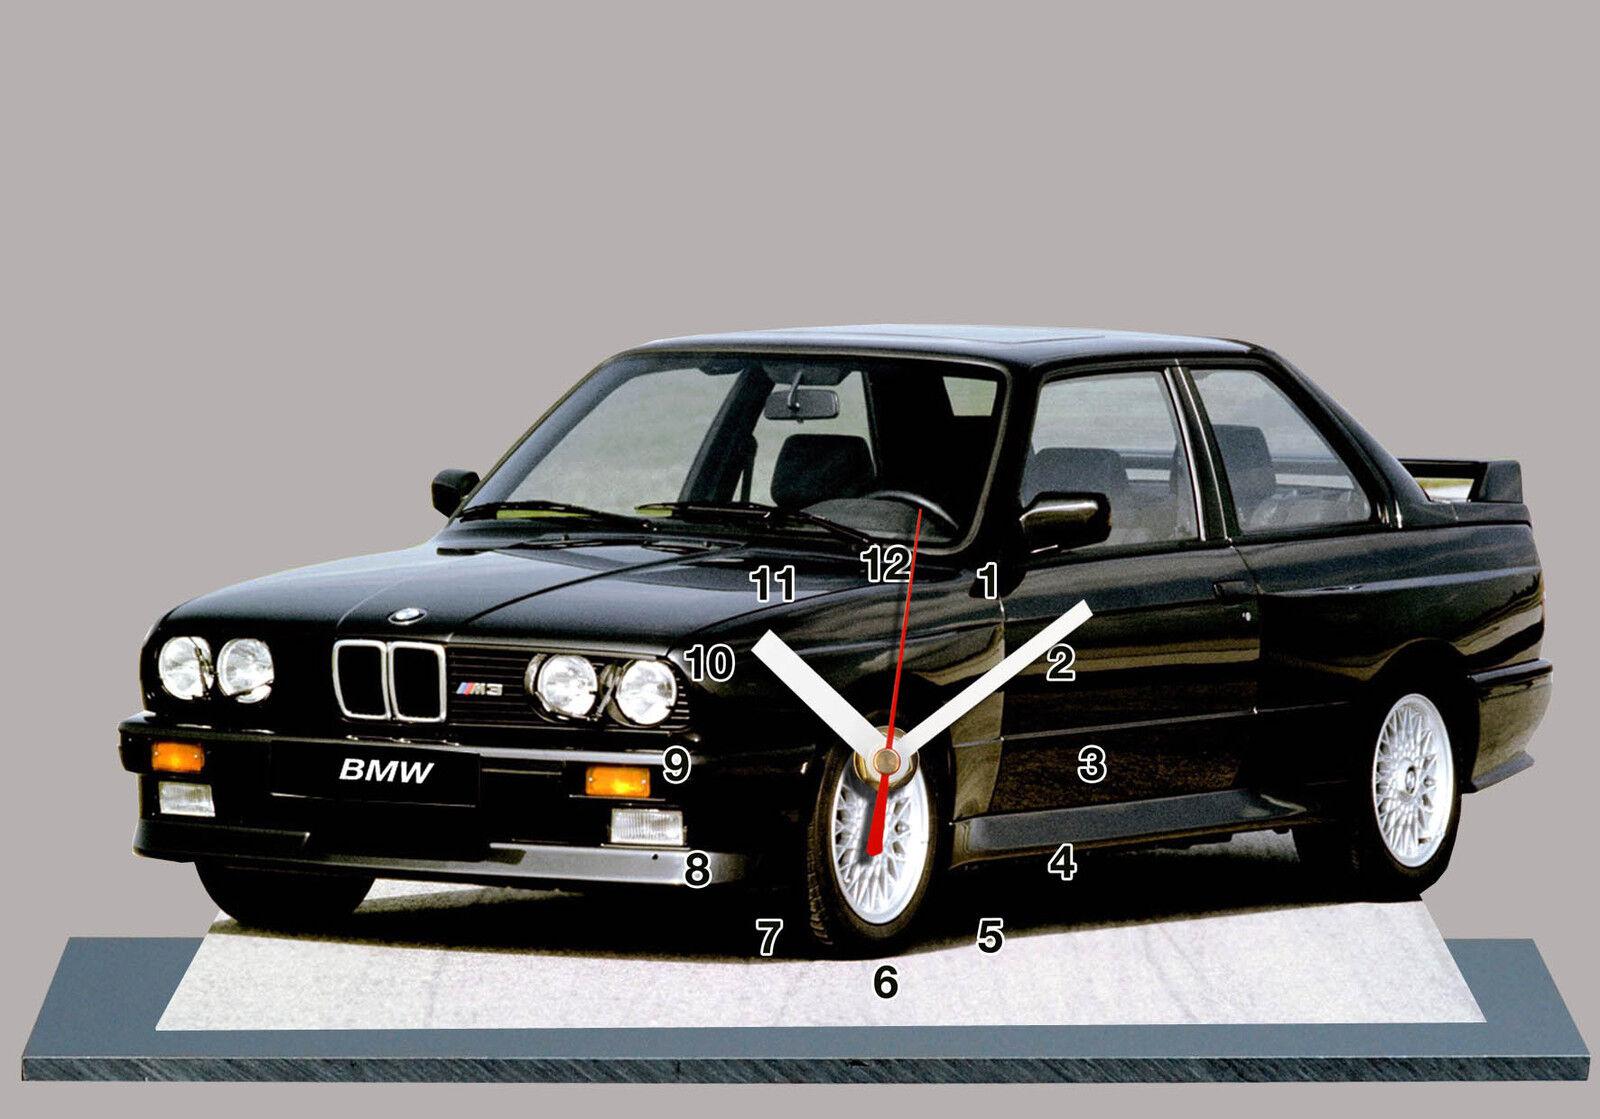 bil BMW M3 E30 -04, bil IN guldLOGIO MINIATURA